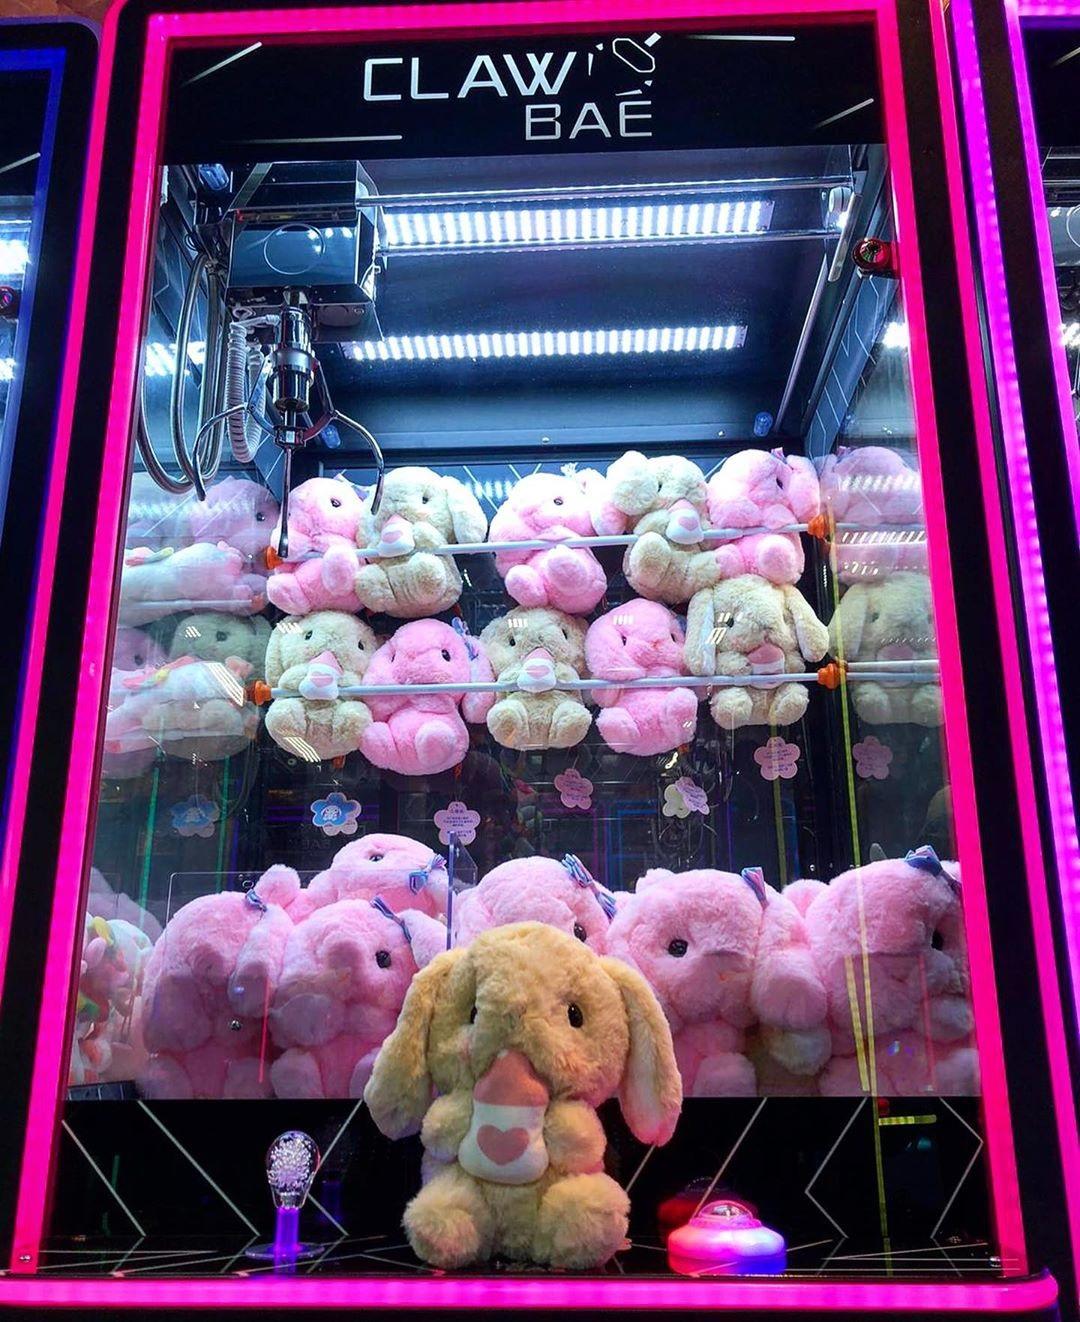 claw machine arcades 2019 bunny